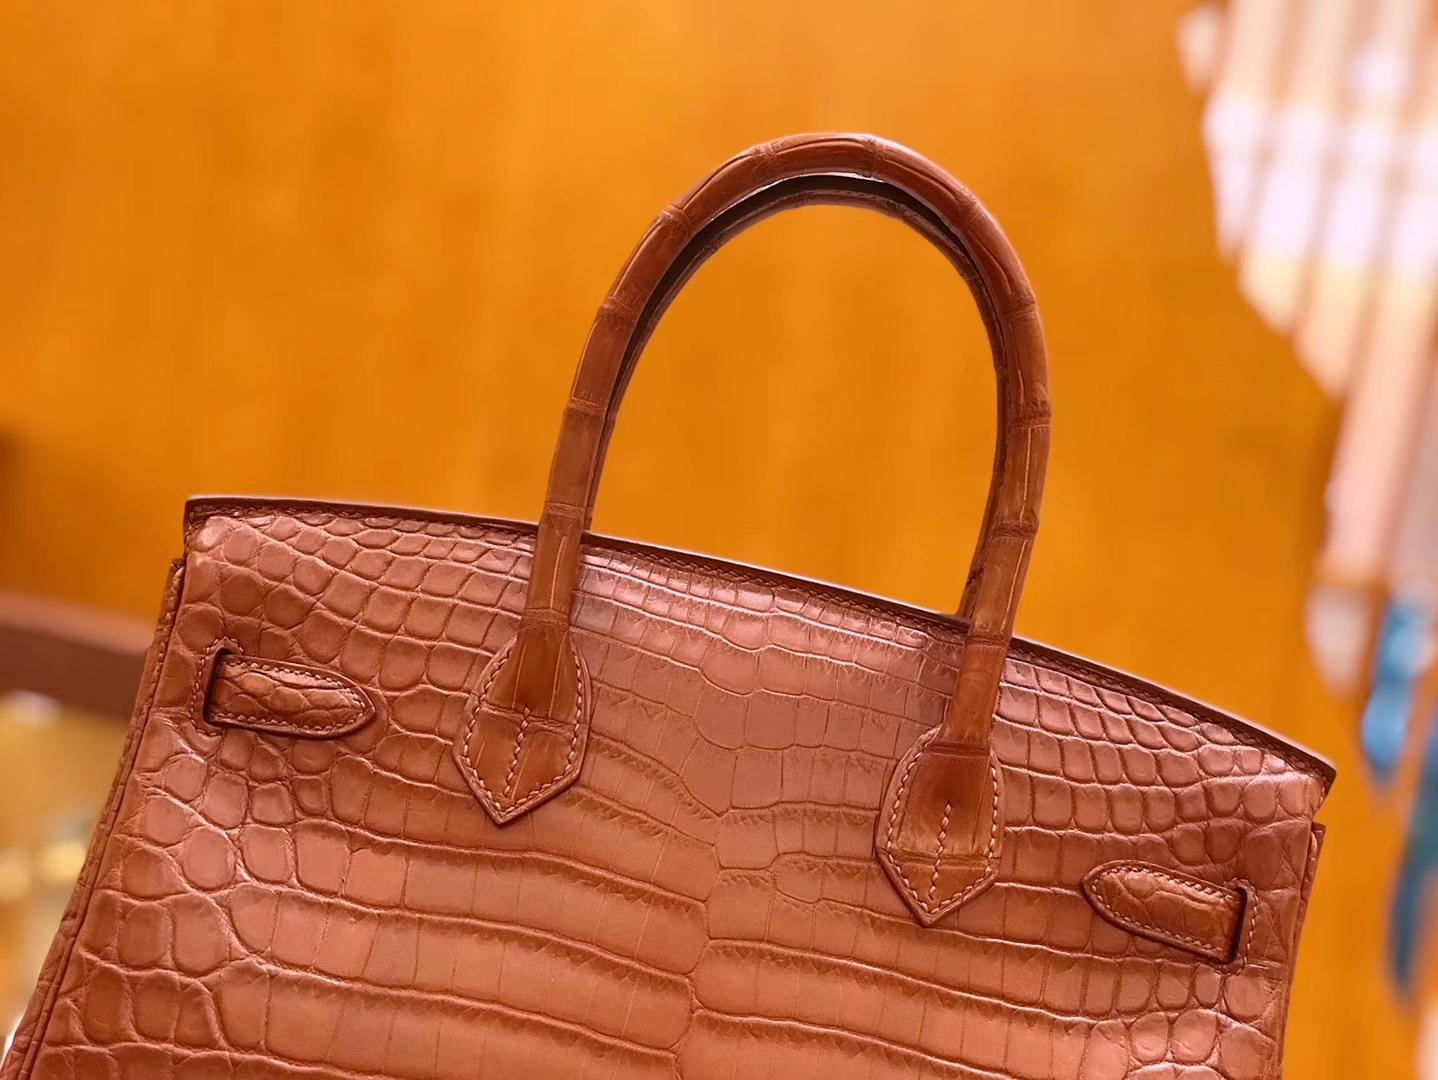 Hermès(爱马仕)Birkin 铂金包 尼罗鳄鱼皮 蜜糖棕 30cm